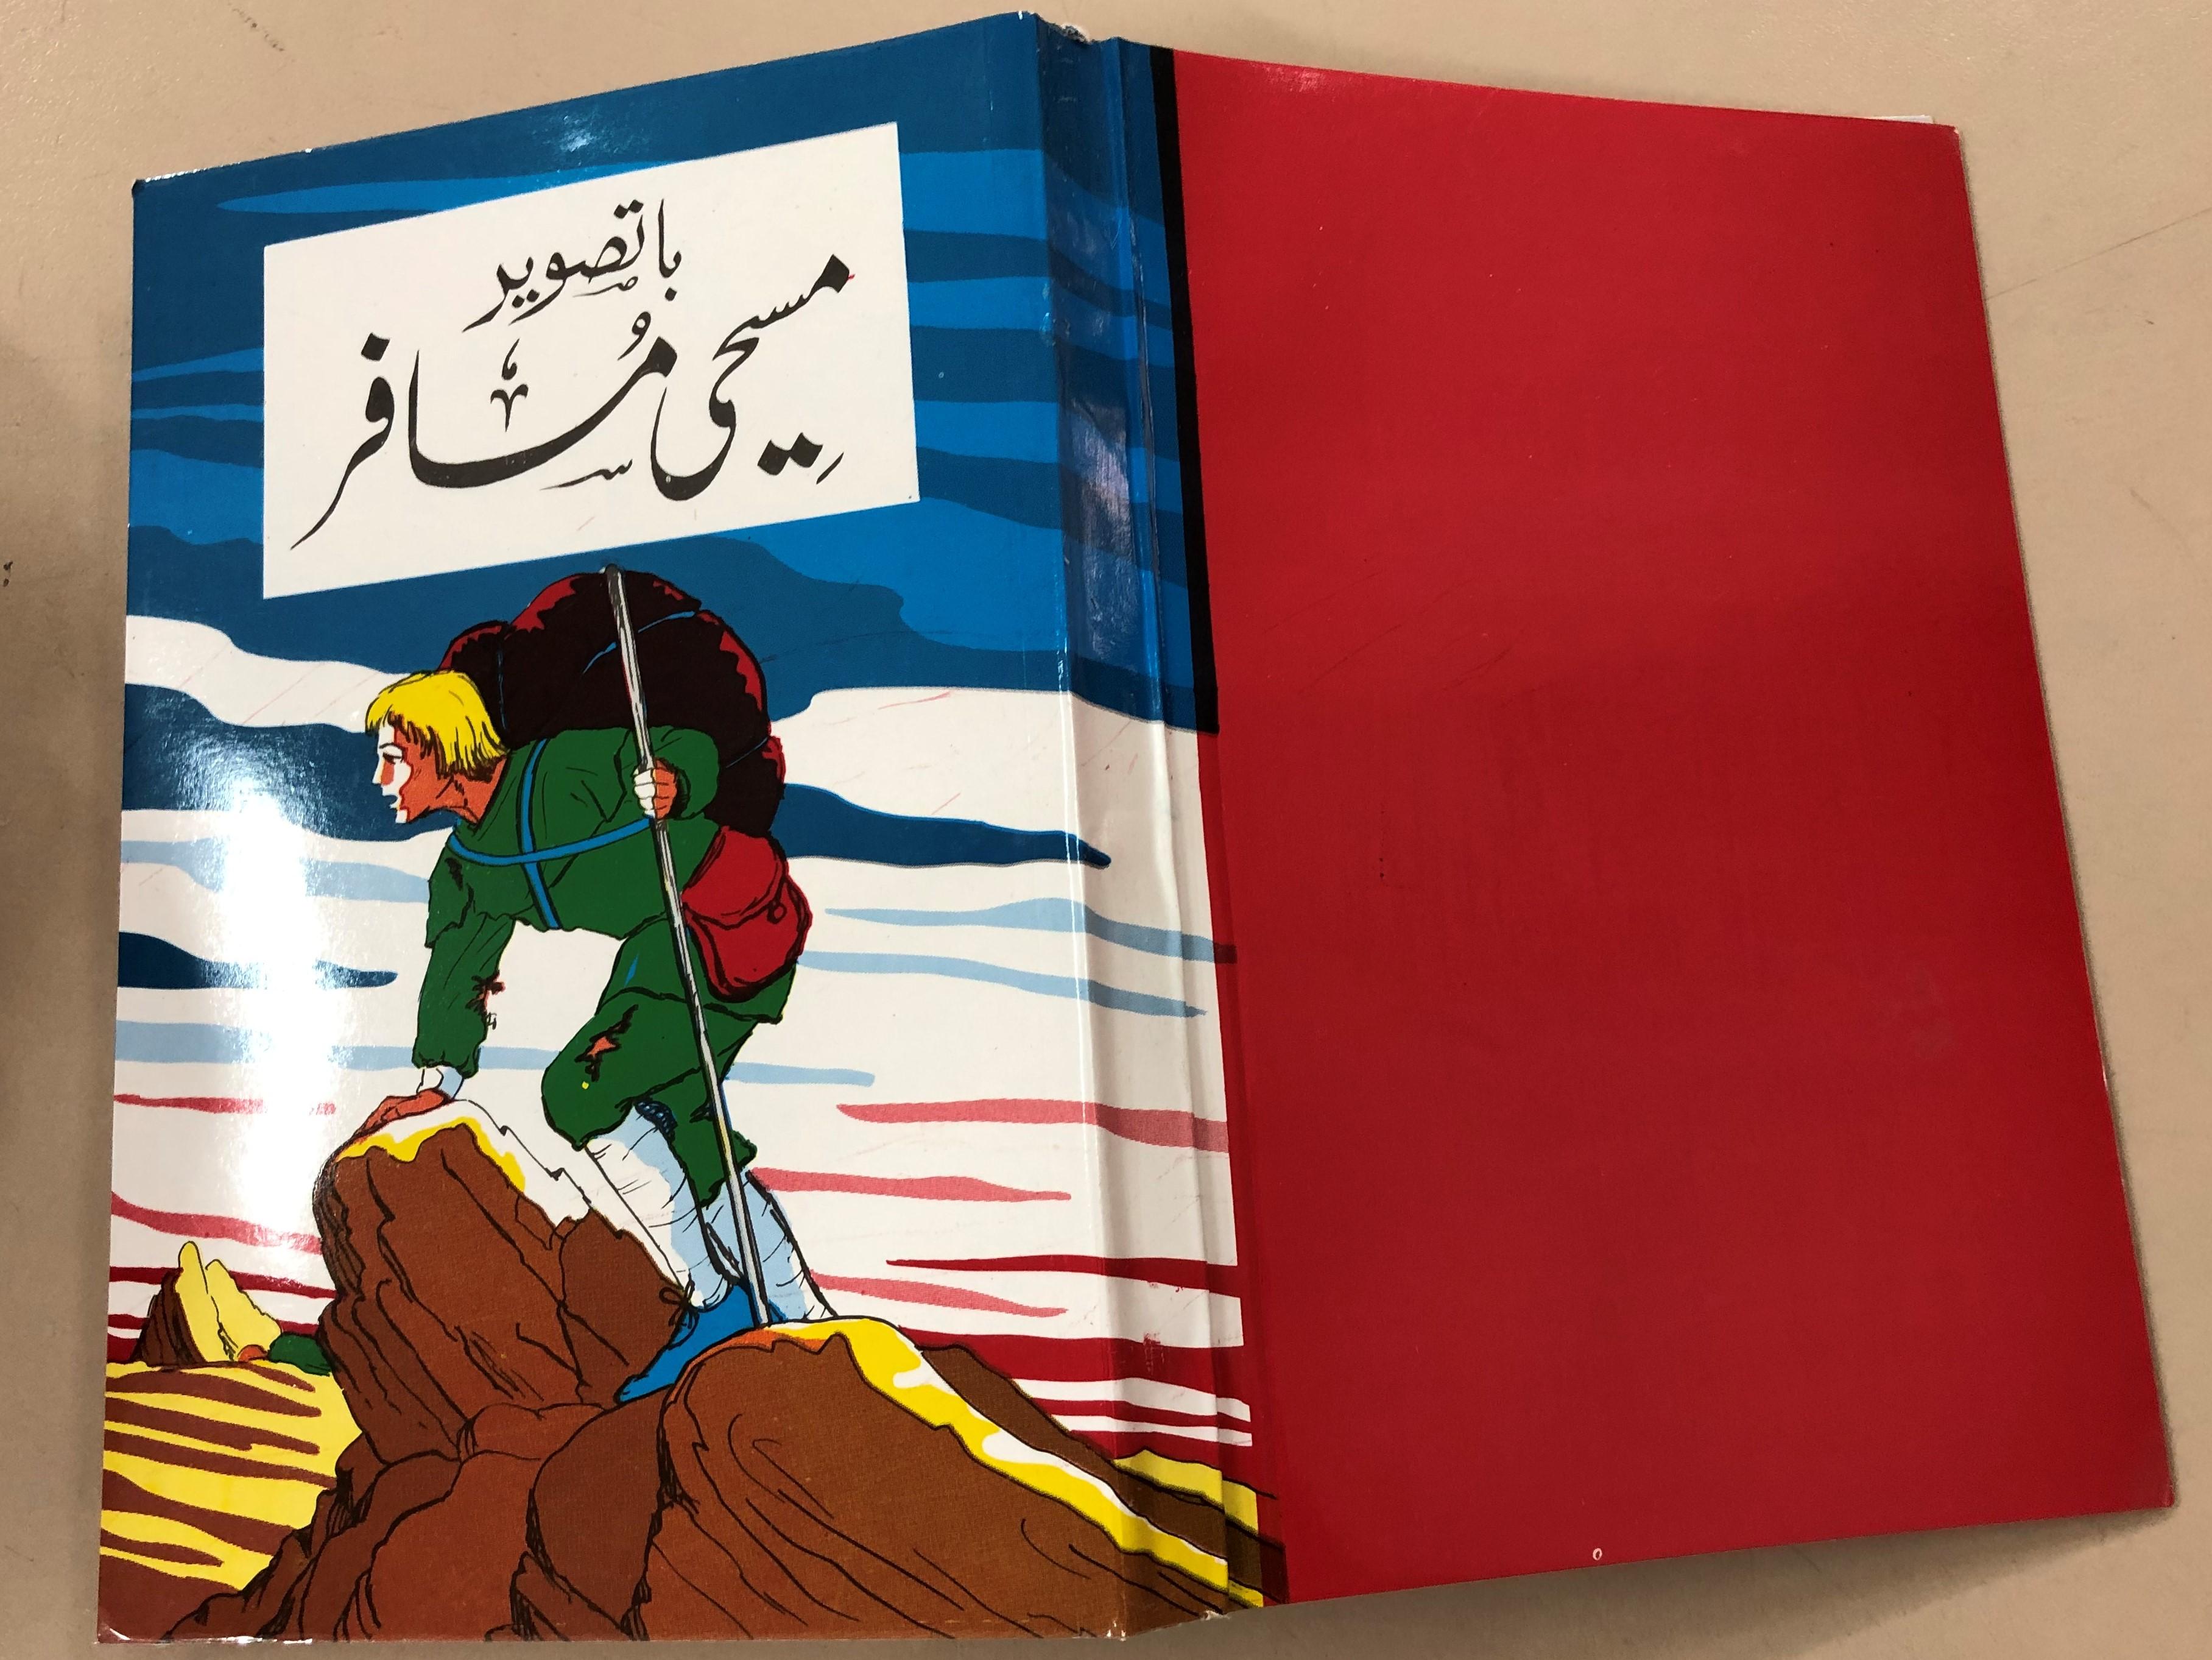 pictorial-pilgrim-s-progress-by-john-bunyan-in-urdu-language-hardcover-2019-masihi-isha-at-khana-13-.jpg